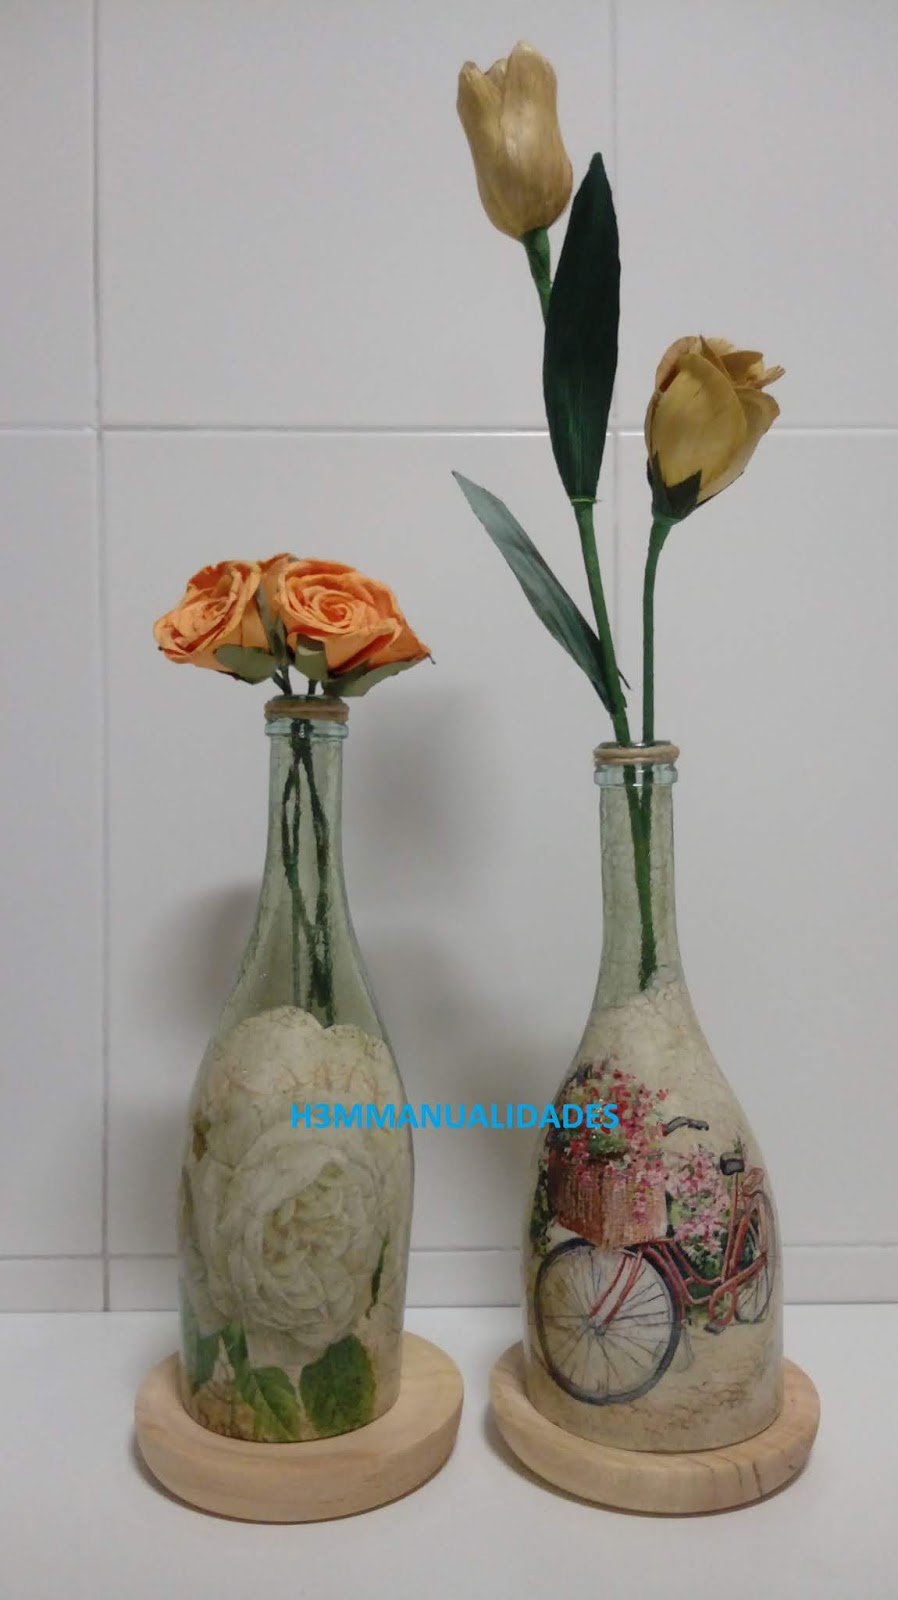 H3m manualidades botellas de cristal cortadas y decoradas - Manualidades con botellas de cristal ...